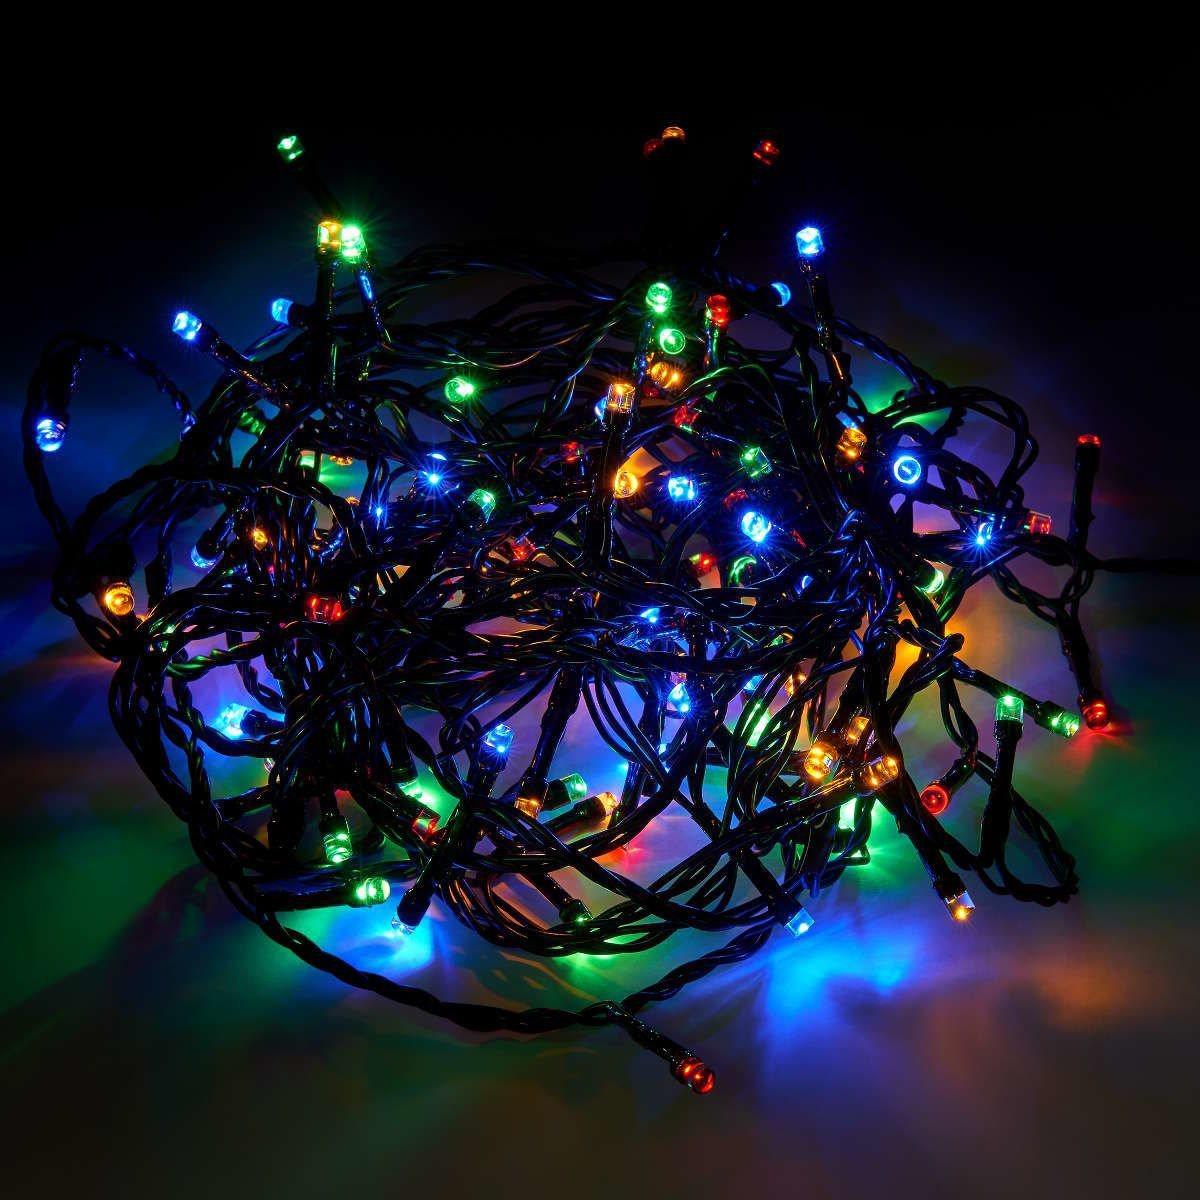 120 LIGHTS »LED Outdoor Lichterkette 120 Lichter«